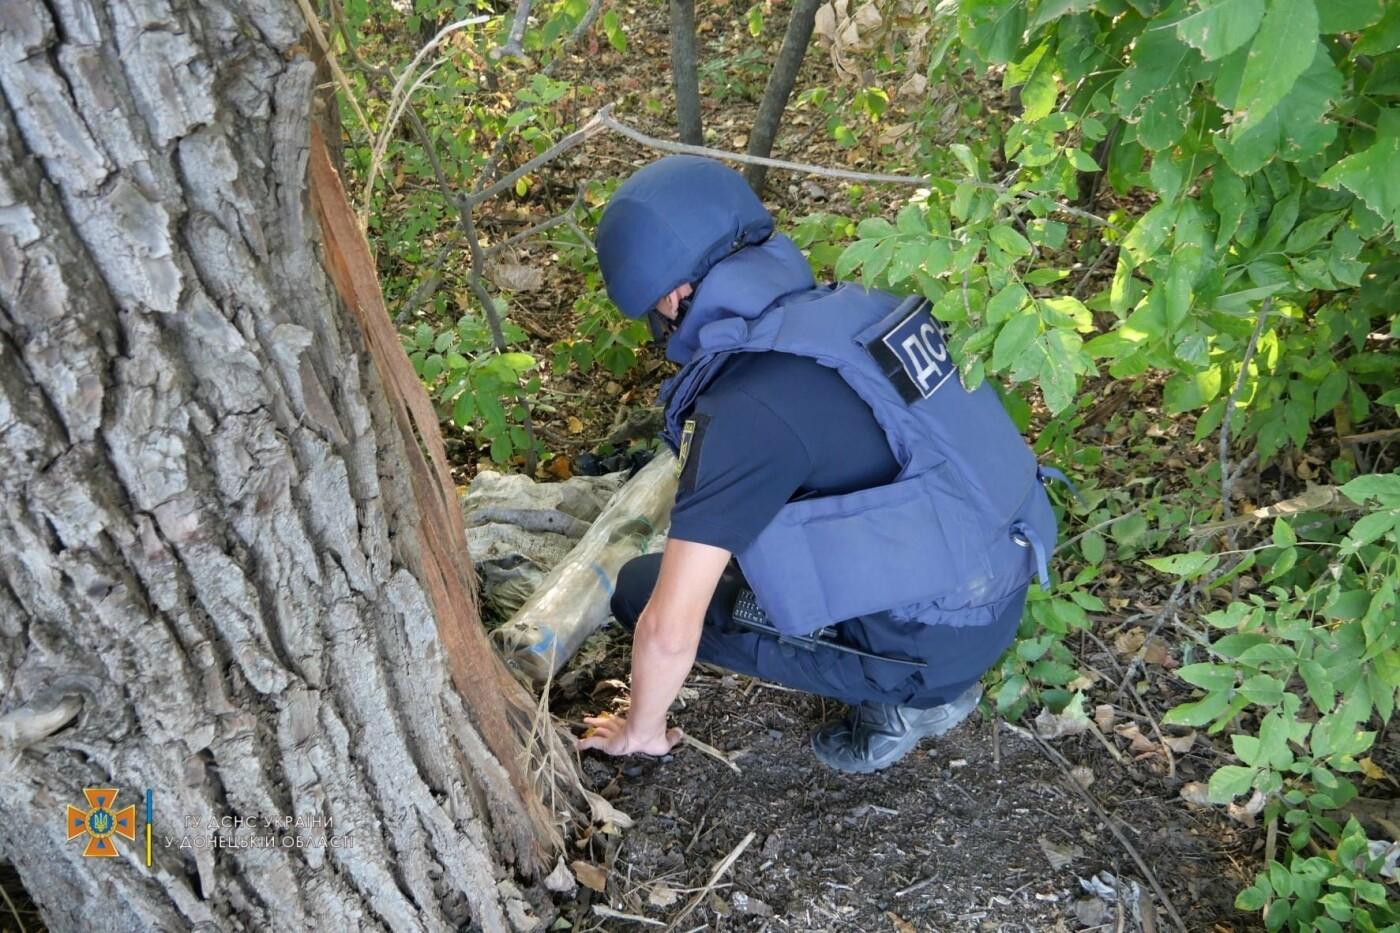 Саперы обезвредили боеприпас на трассе под Волновахой, - ФОТО, фото-4